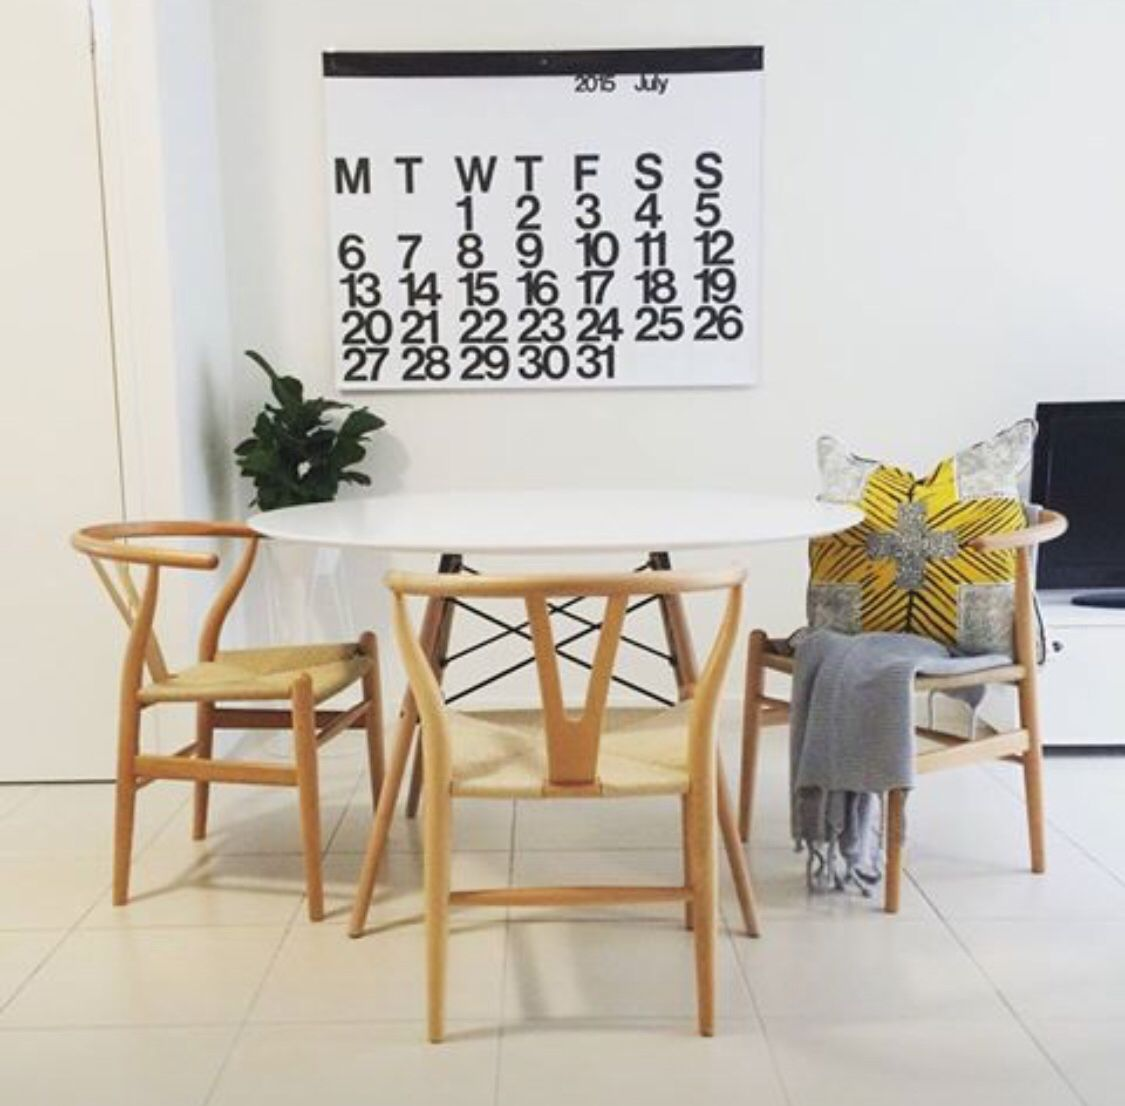 Hans Wegner Wishbone Chair   Natural Ash Timber Frame With Natural Cord Seat